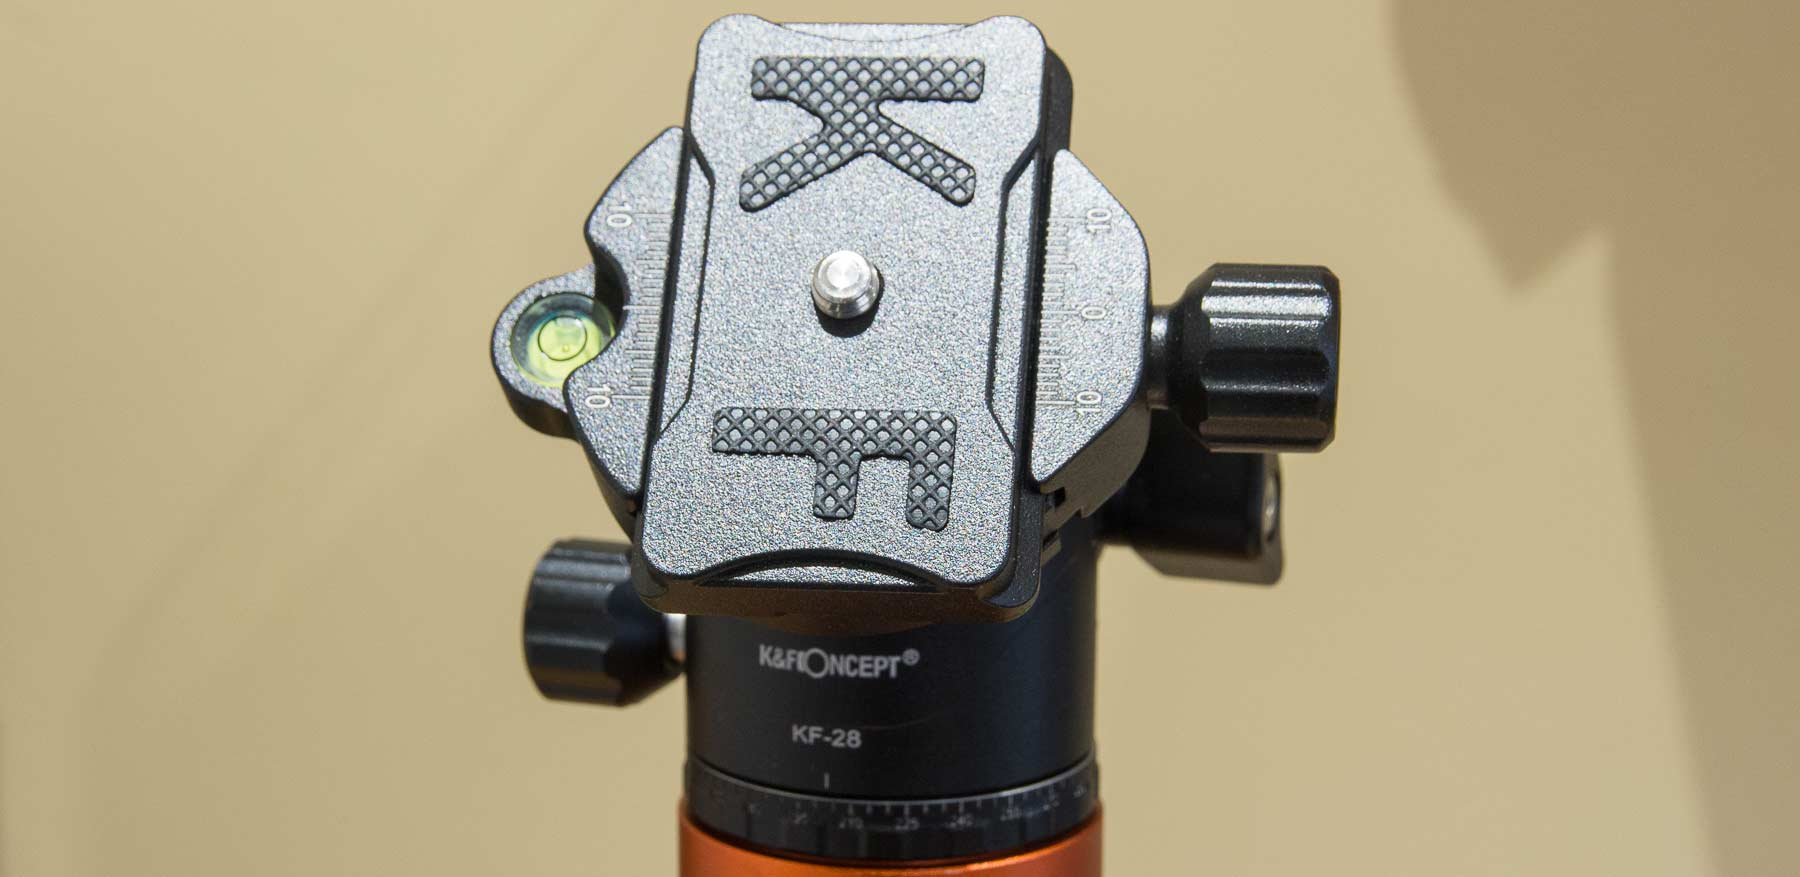 arca-plate for camera